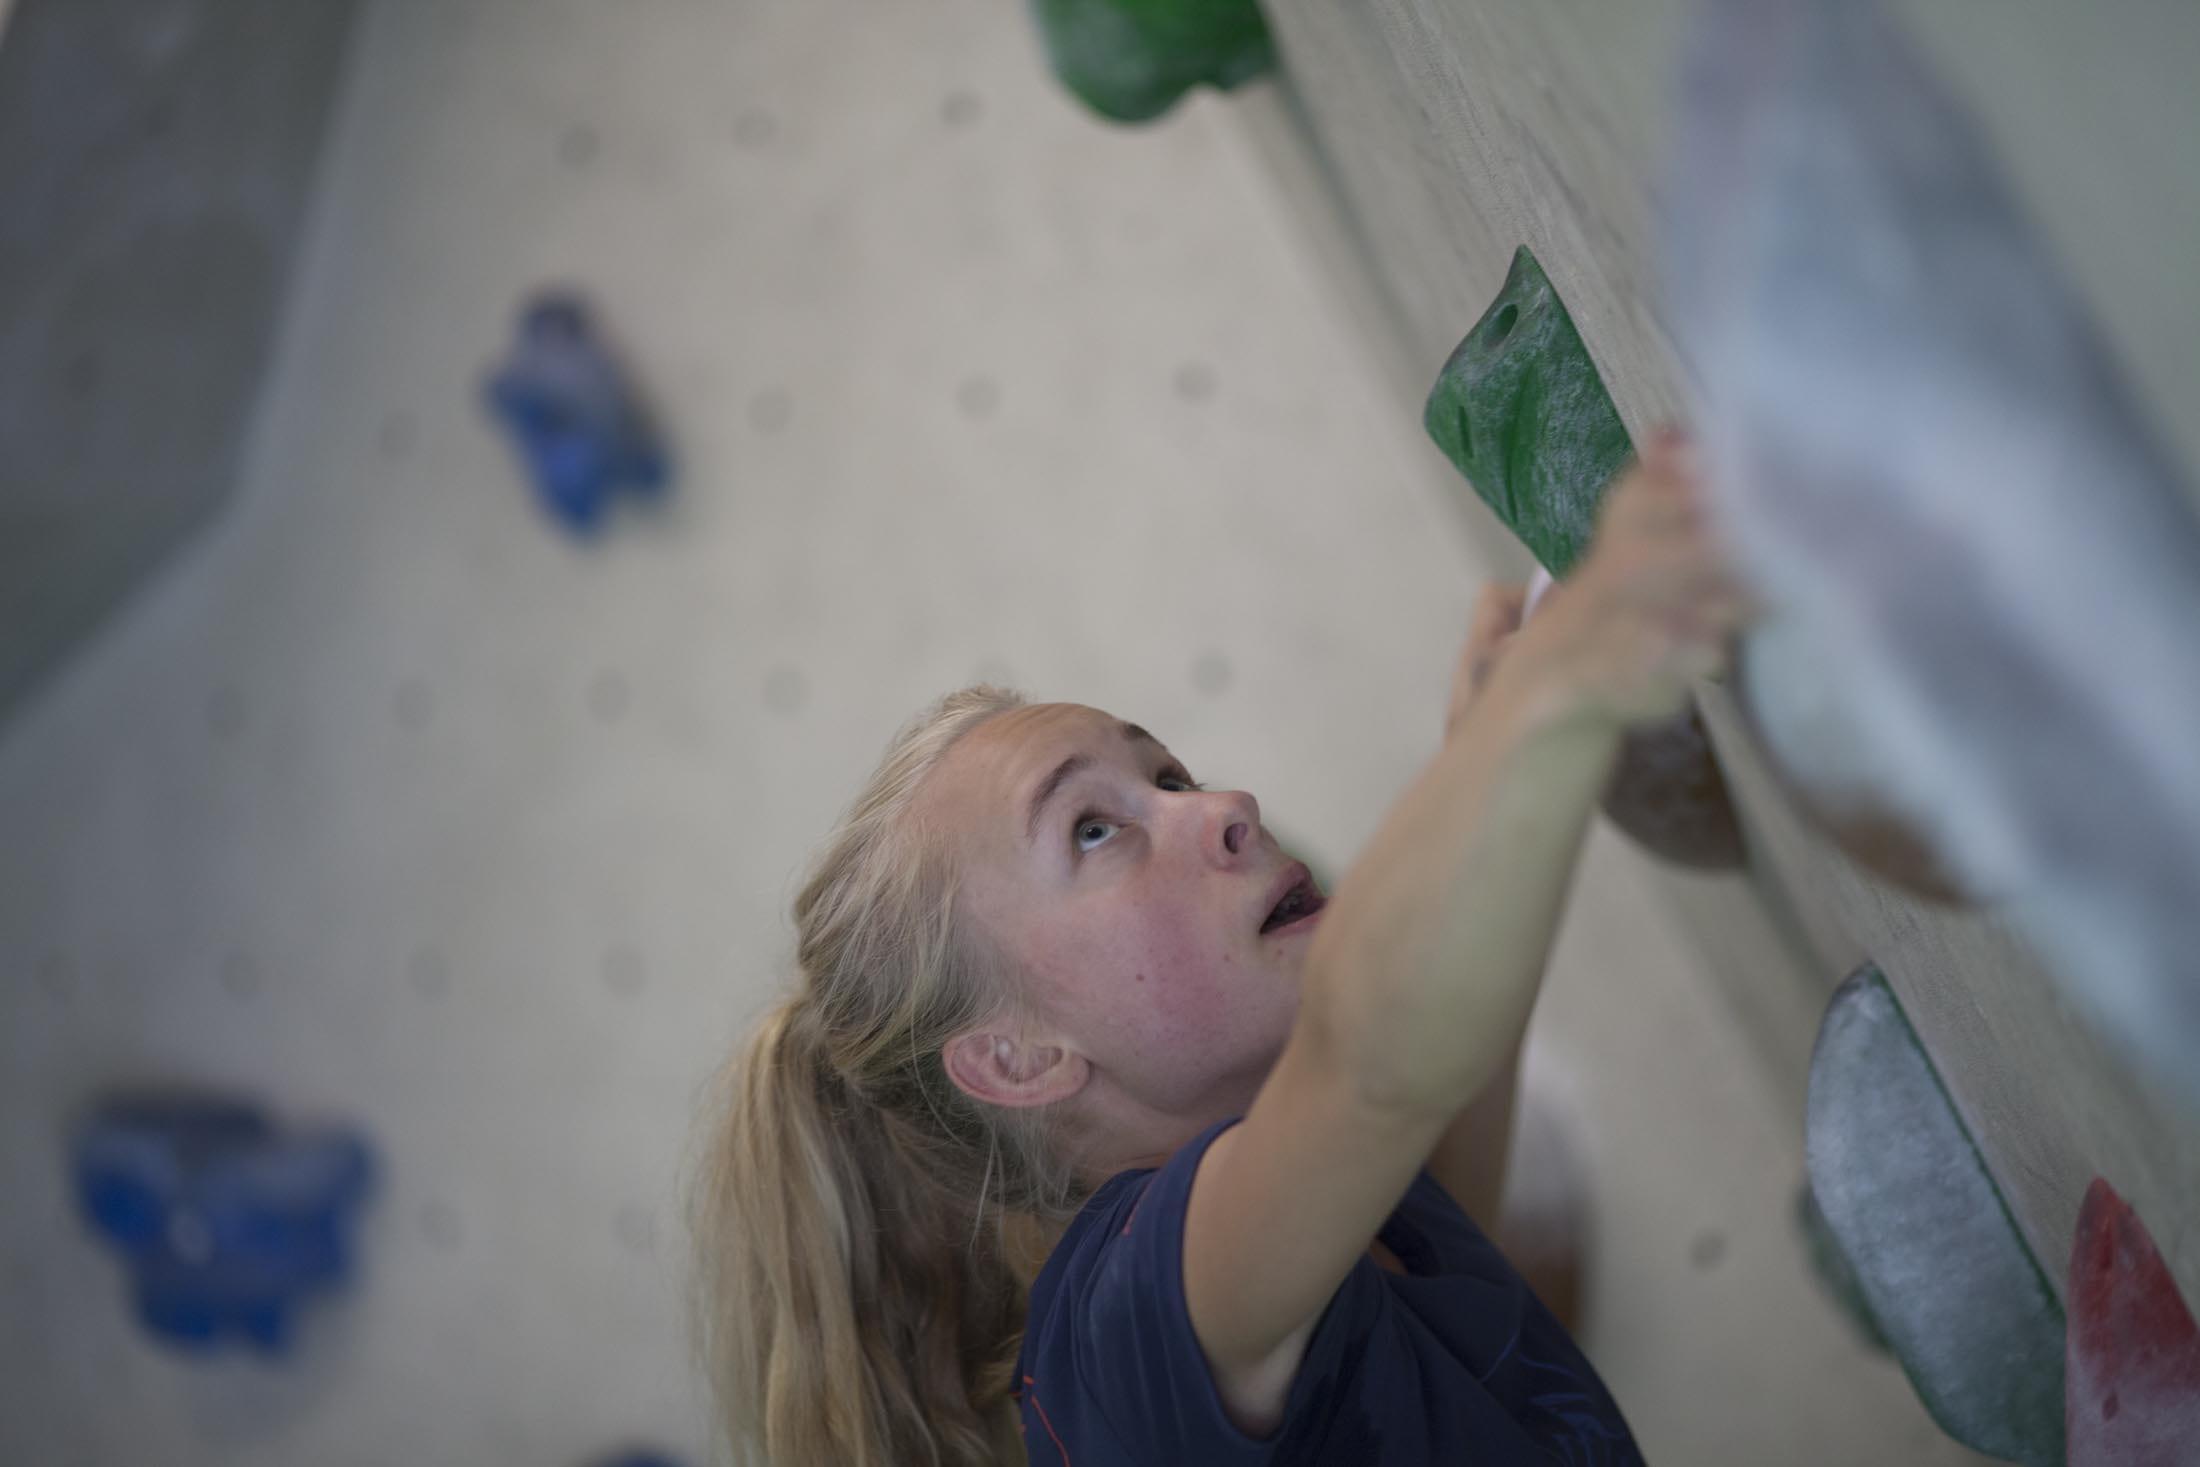 Quali, internationaler bouldercup Frankenjura 2016, BLOCKHELDEN Erlangen, Mammut, Bergfreunde.de, Boulderwettkampf07092016210